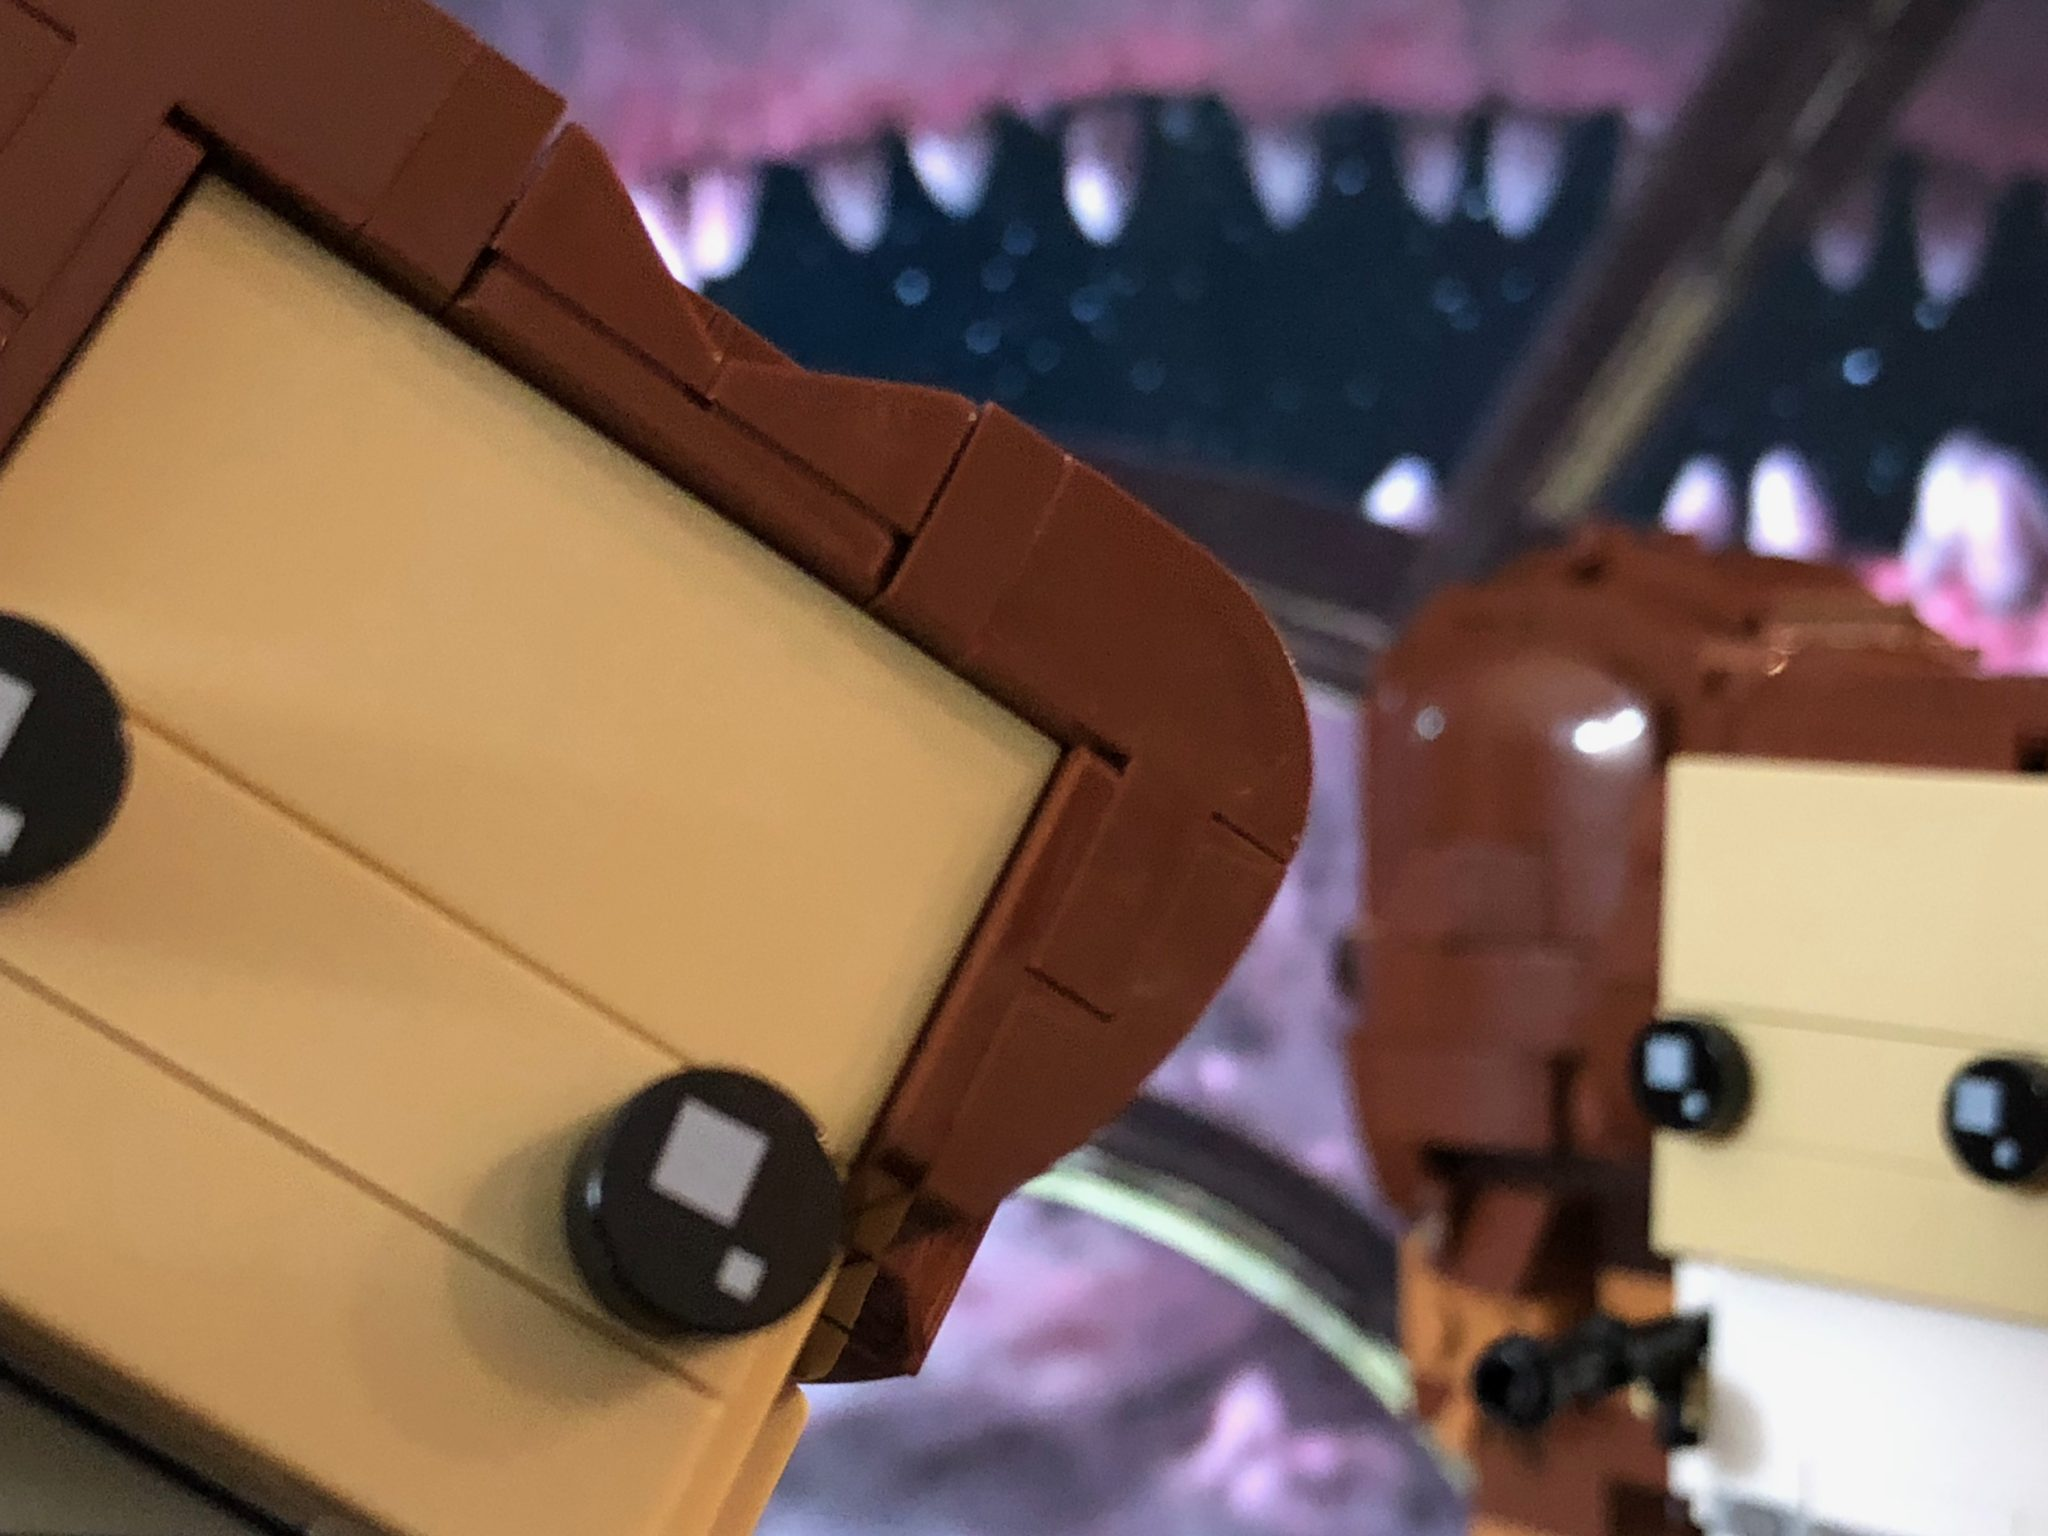 LEGO Brickheadz - Han Solo, Chewbacca, Princess Leia